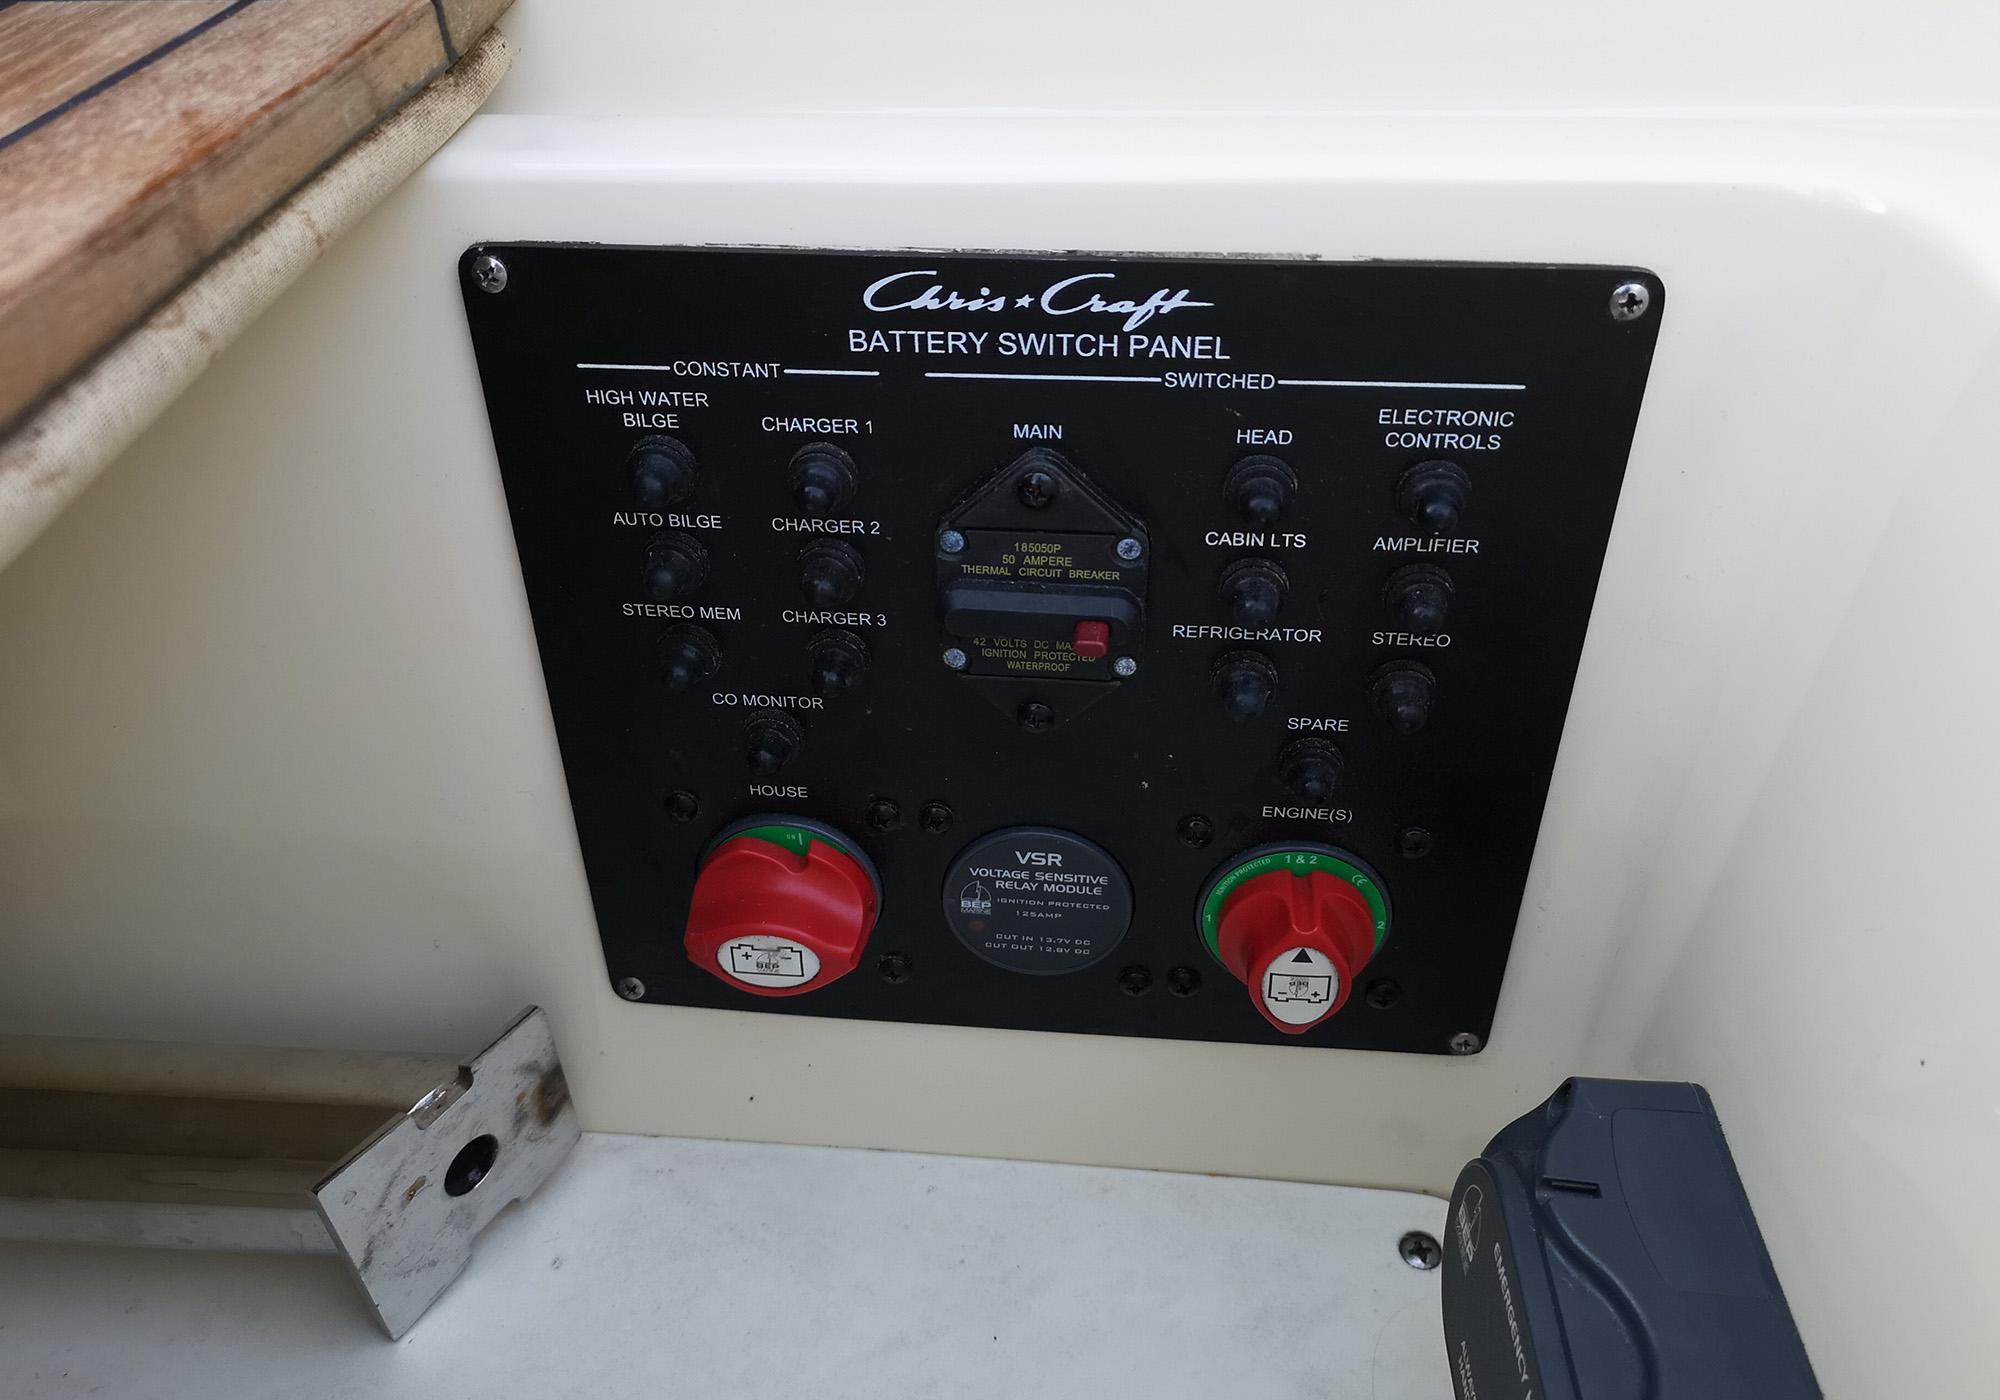 Chris craft corsair 28